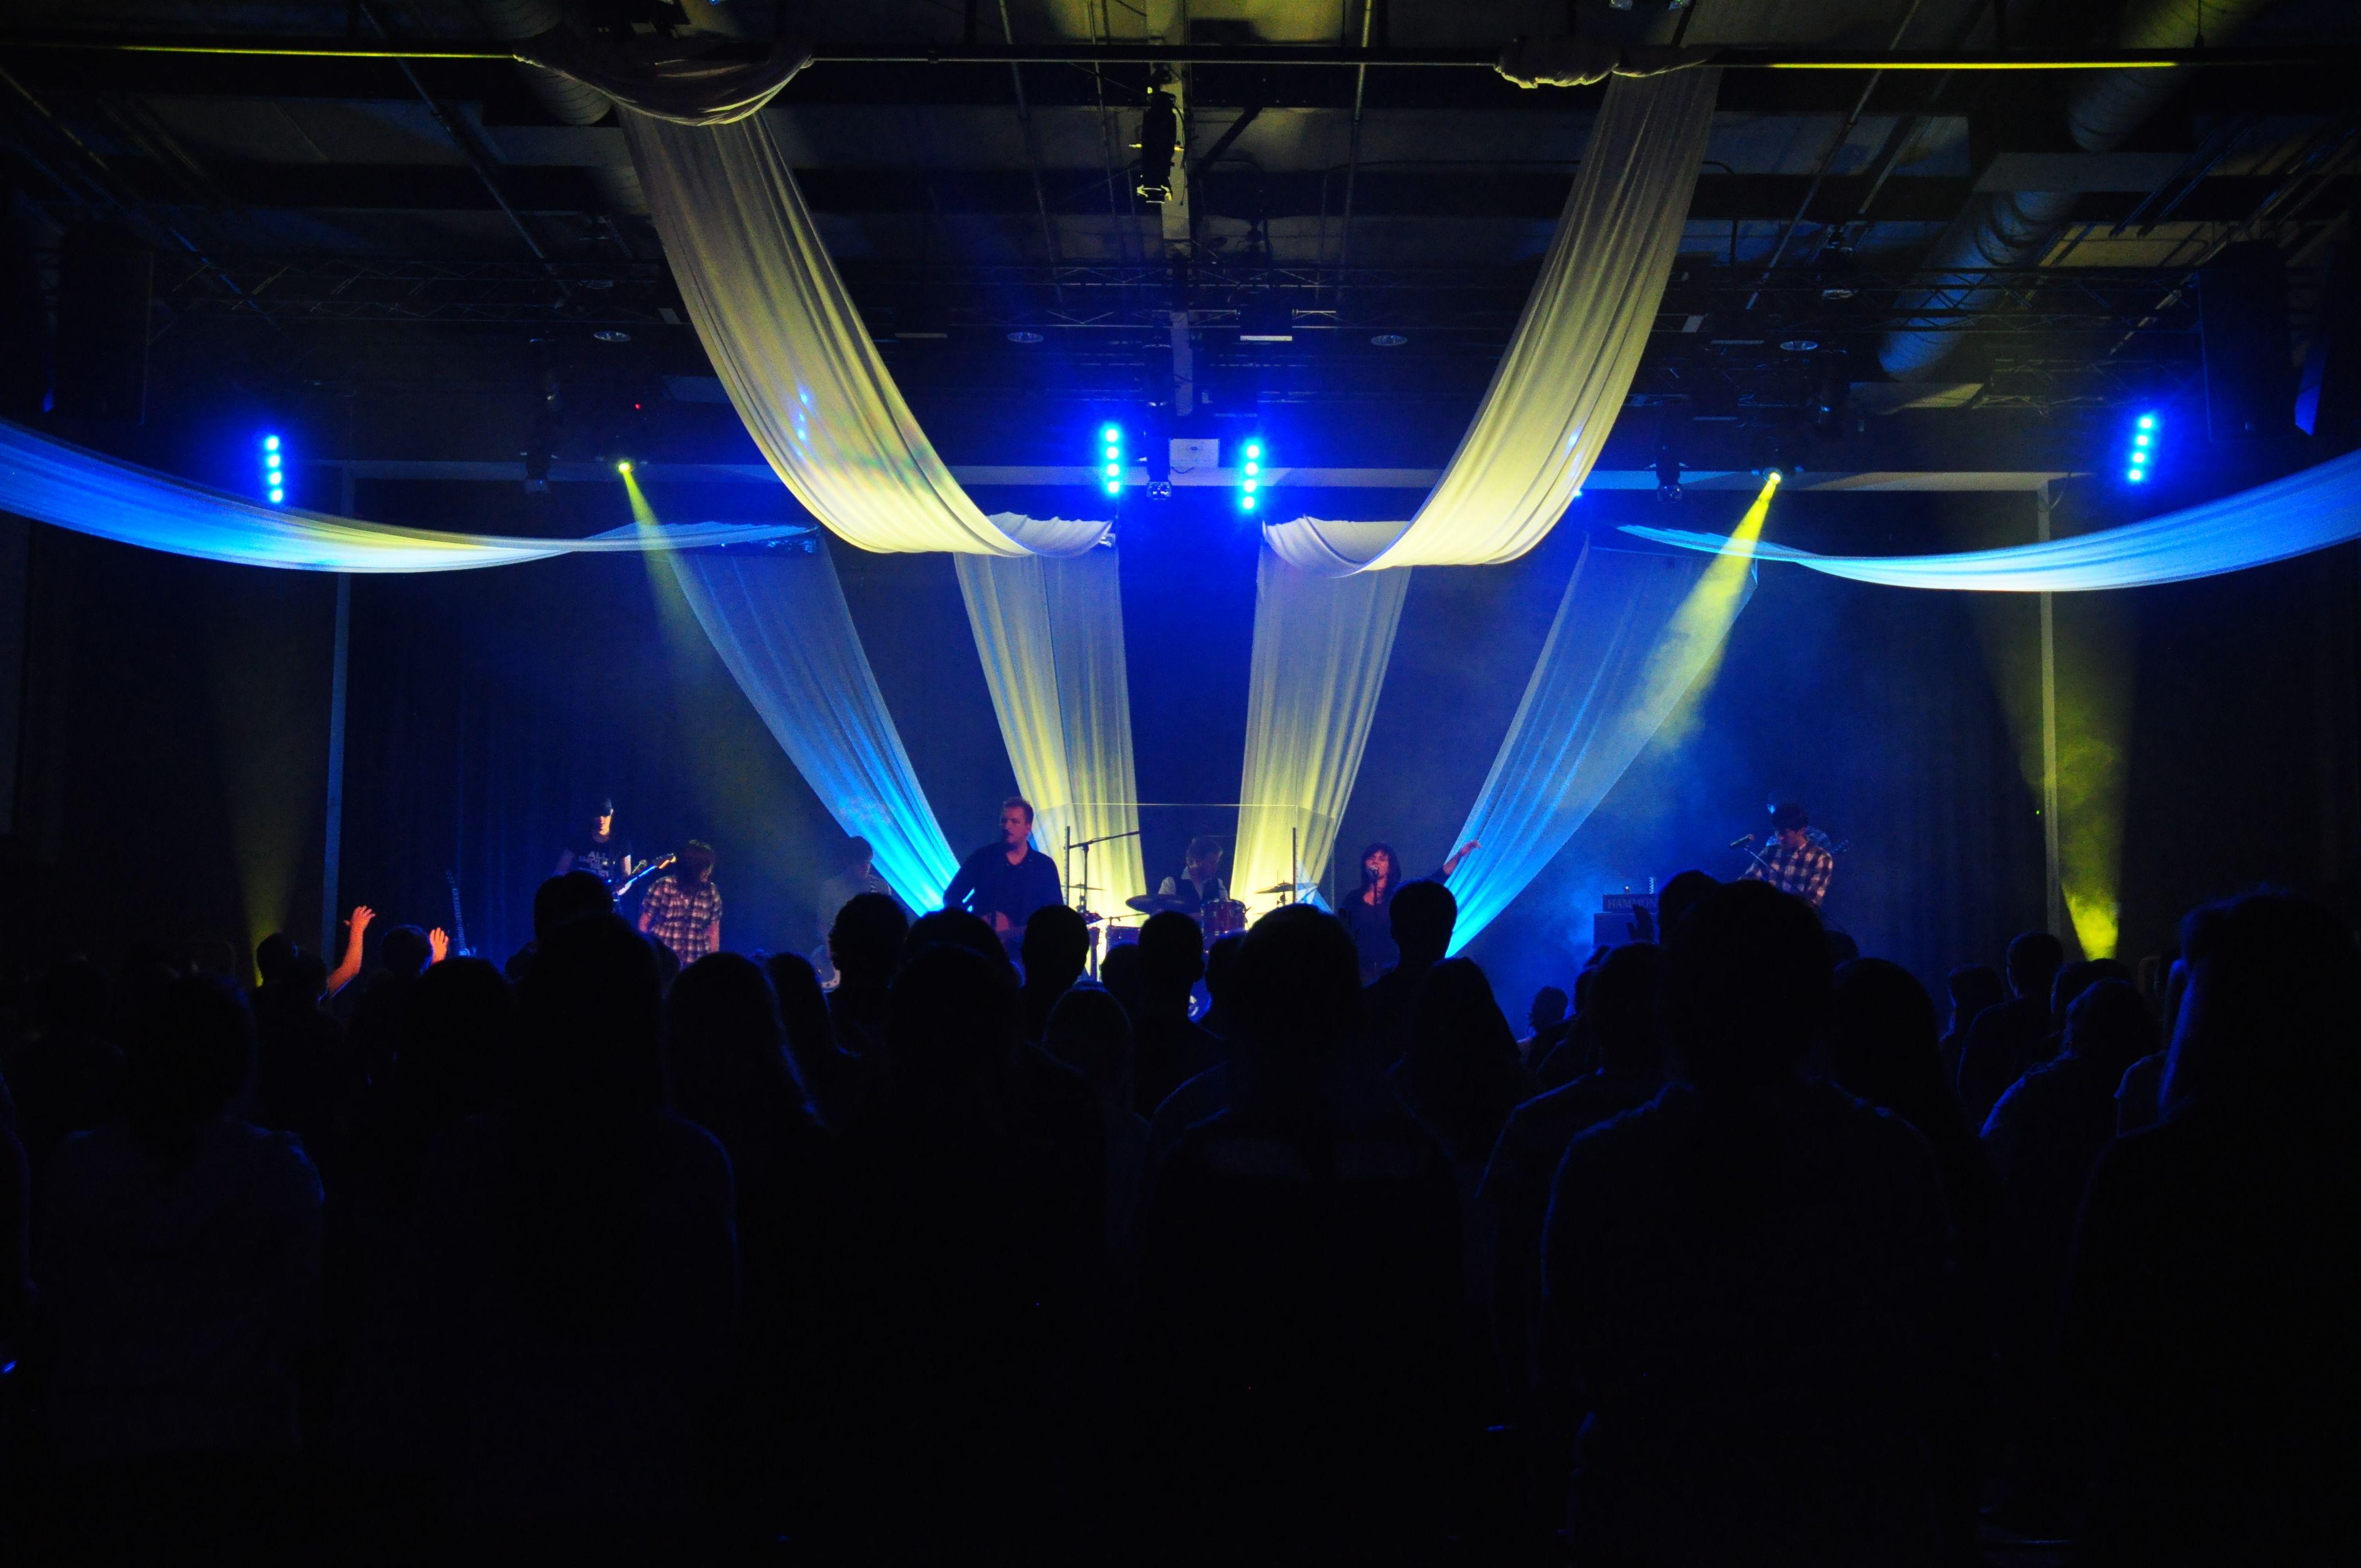 church stage design worship ideas stage set the stage church ideas set